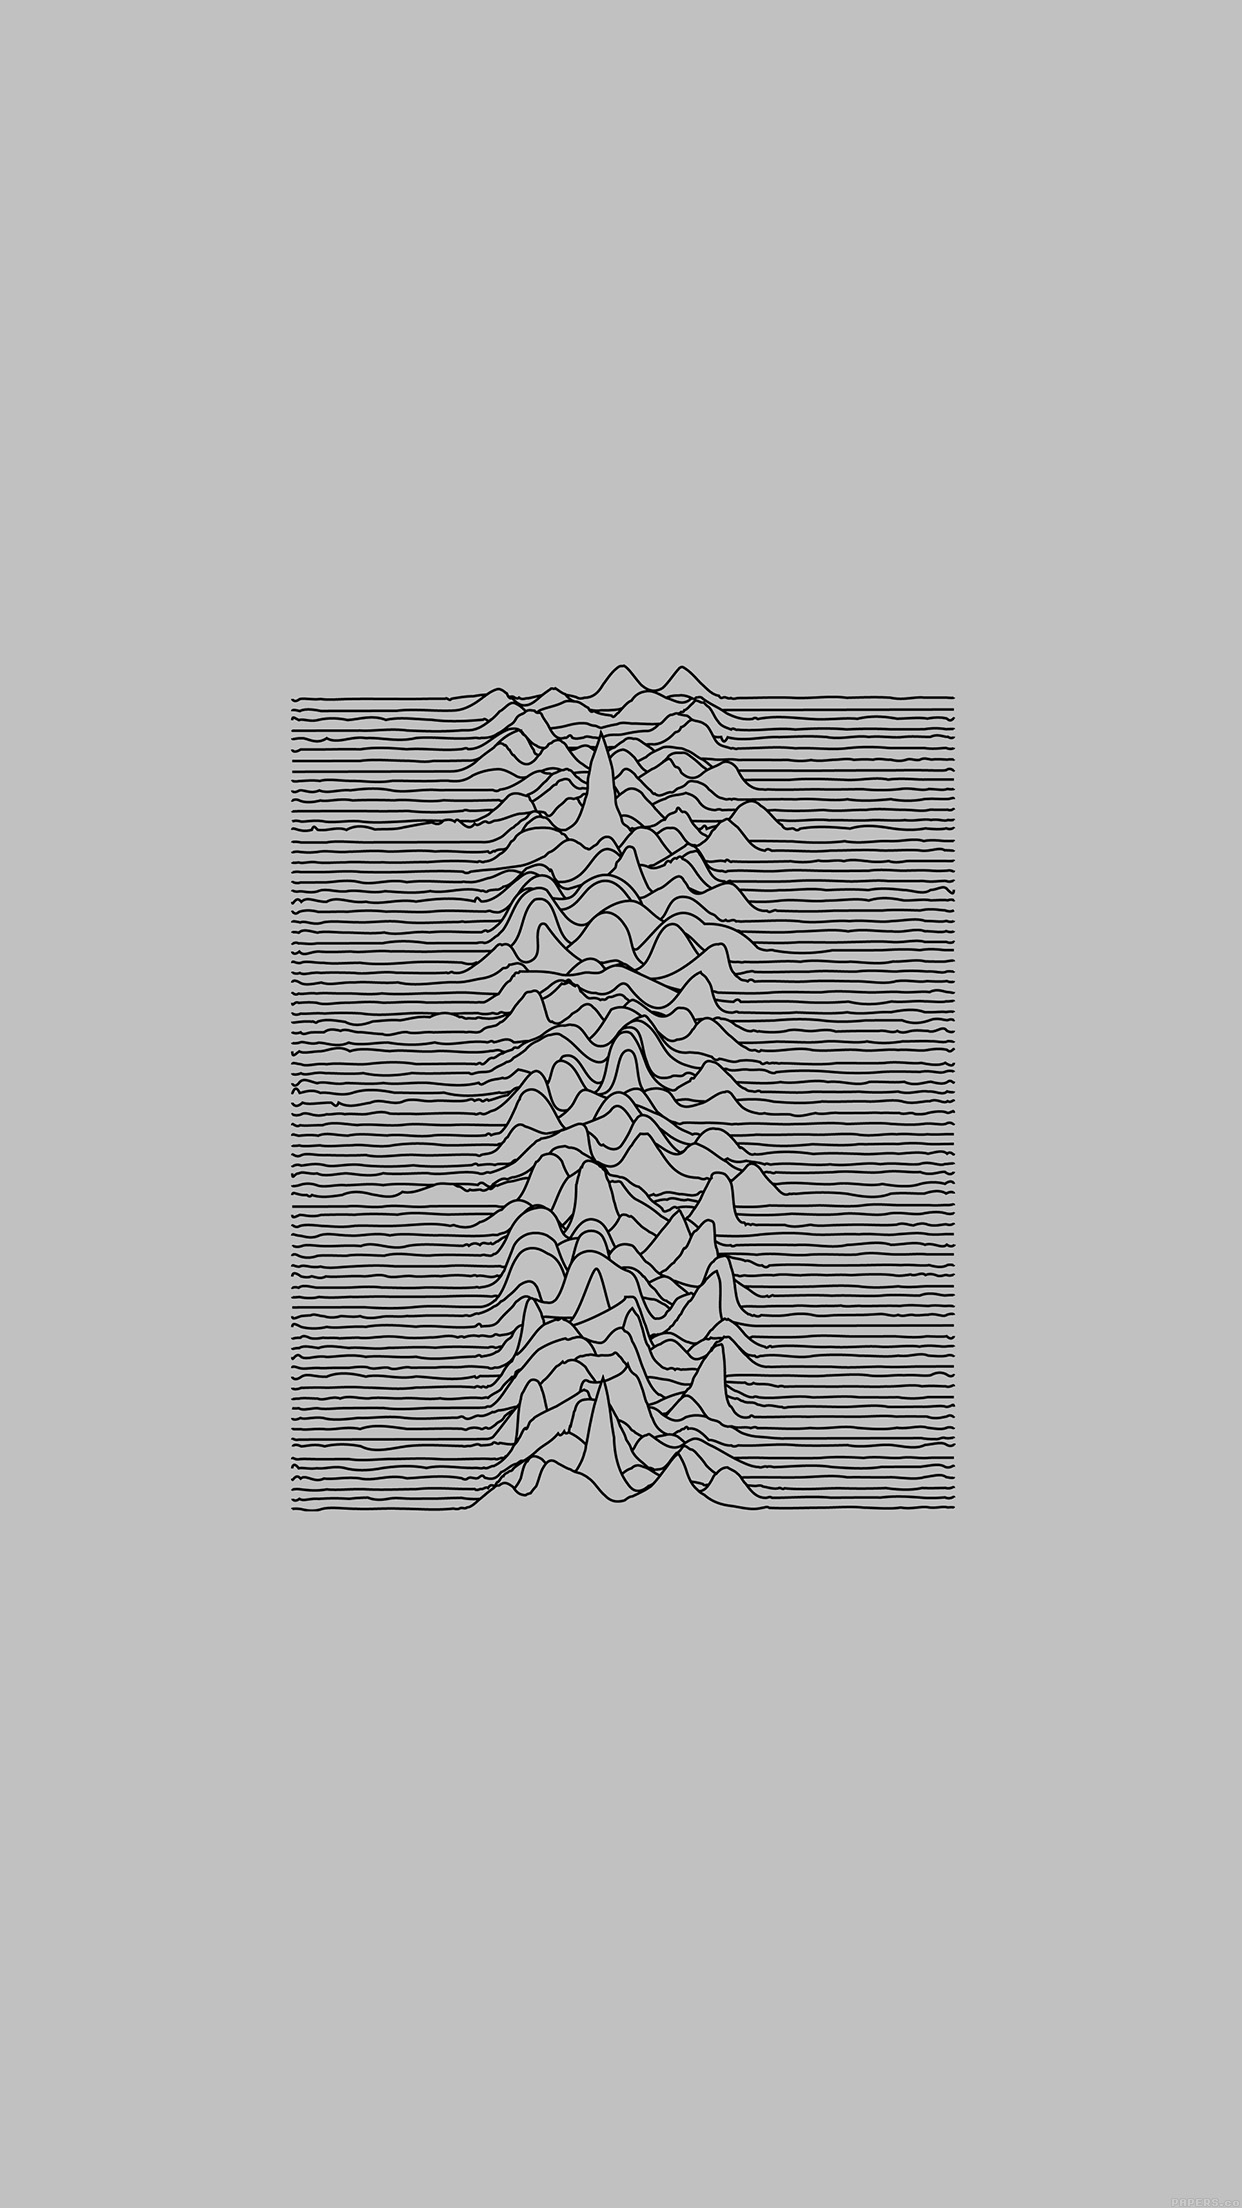 Ai51 Joy Division Unknown Pleasures White Art Minimal Wallpaper